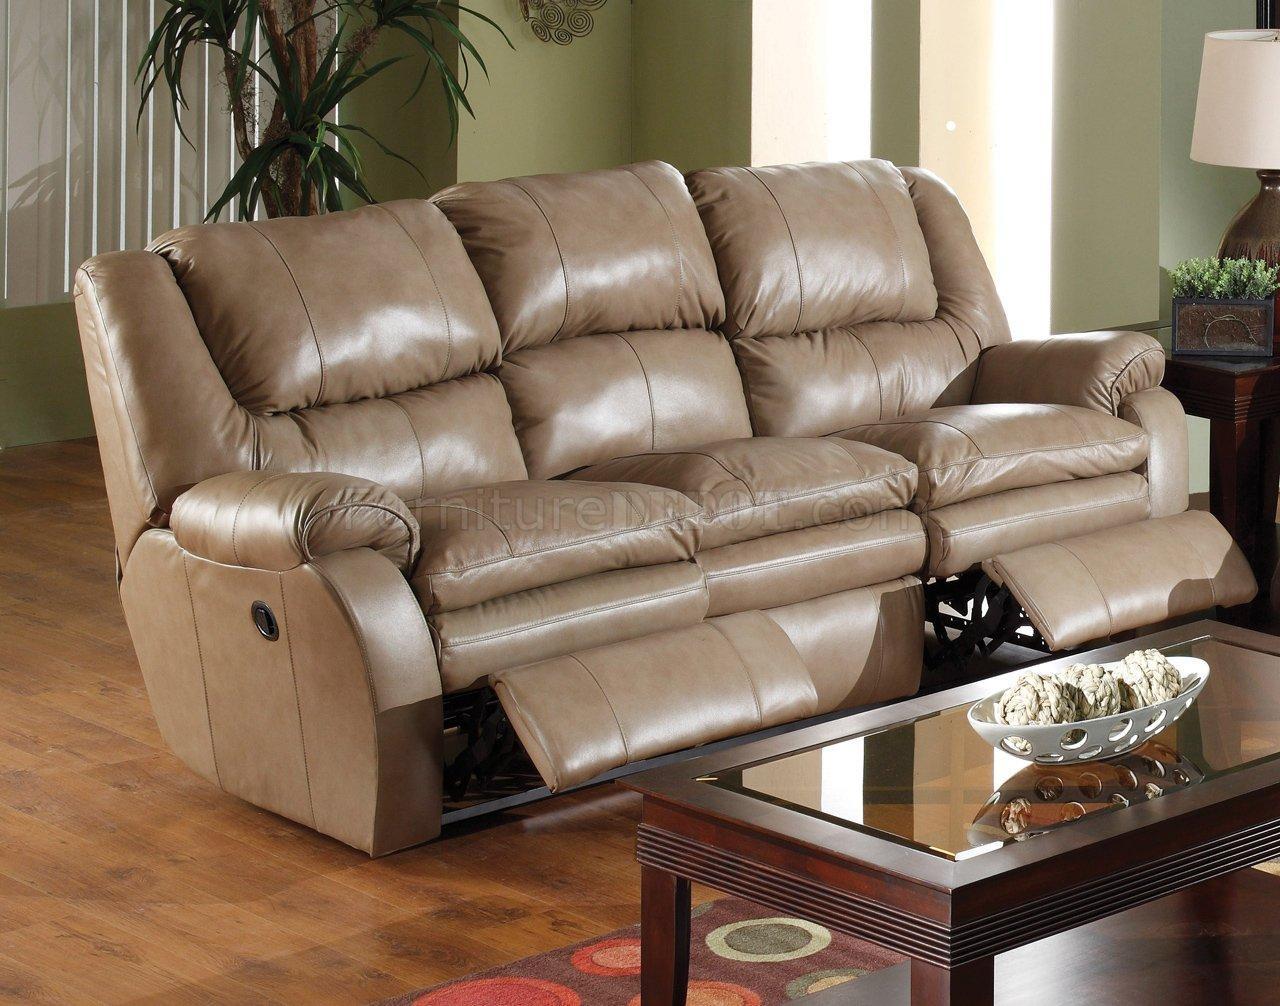 voyager lay flat triple reclining sofa beds futons uk 20 photos catnapper sofas ideas